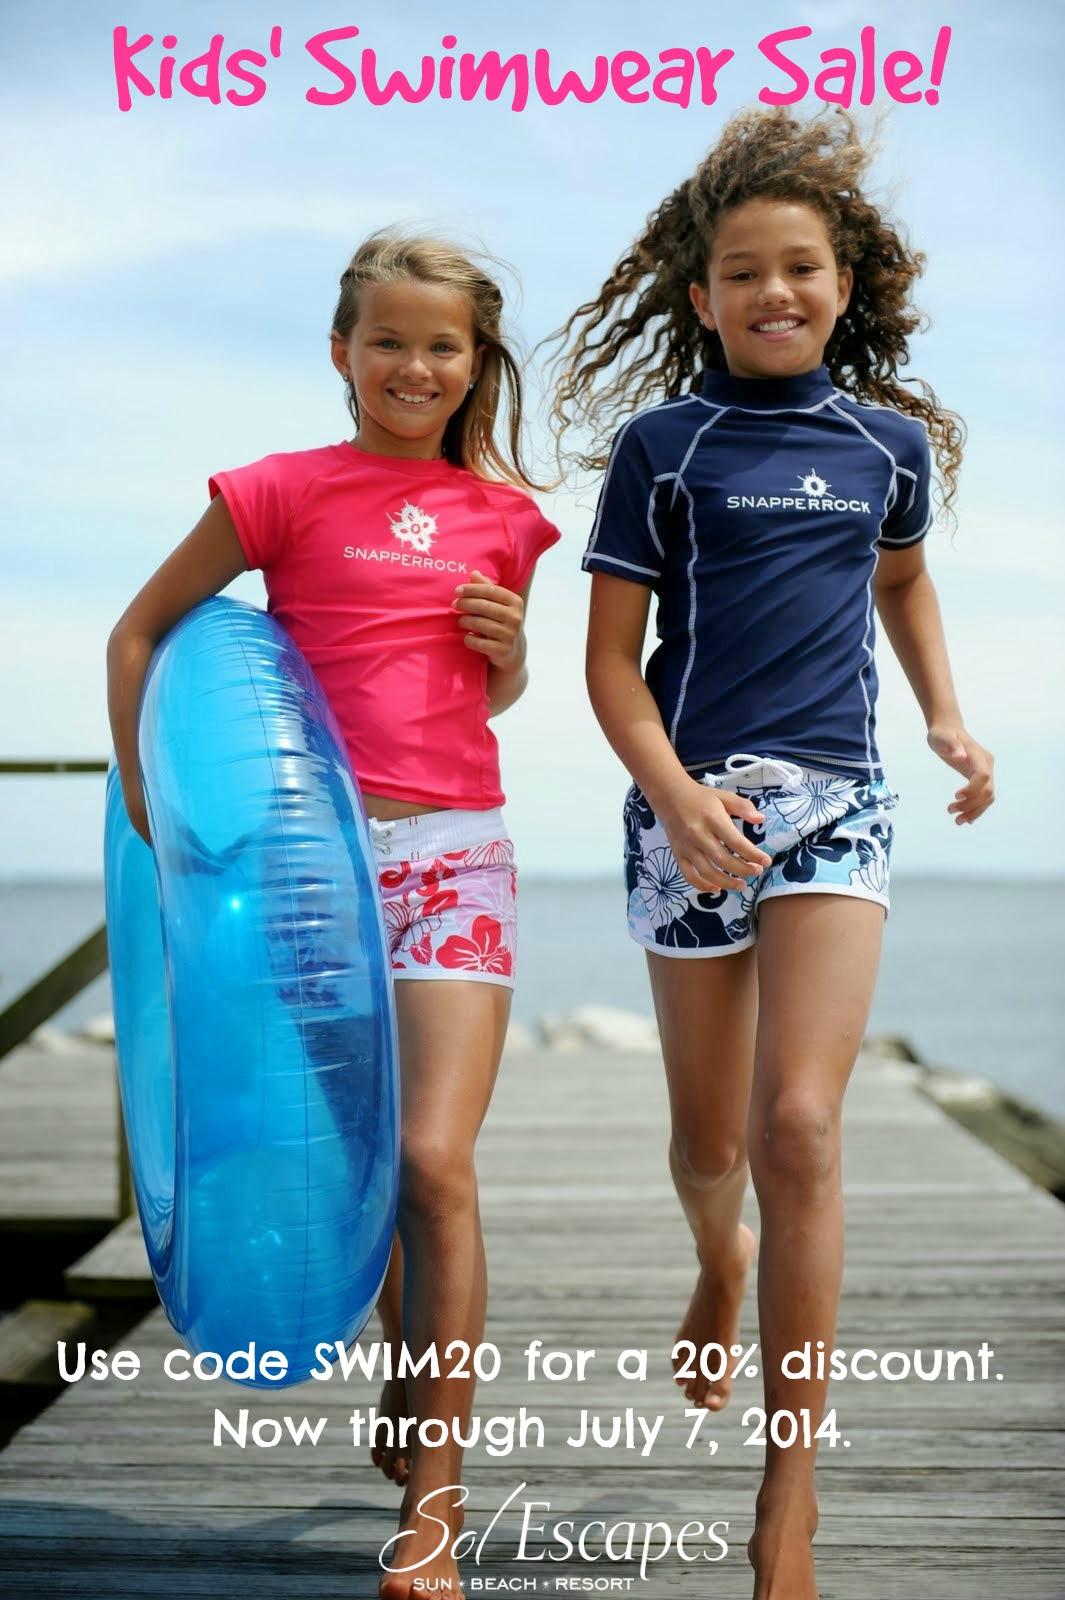 http://www.solescapes.com/Kids-Swim-Wear-s/1844.htm